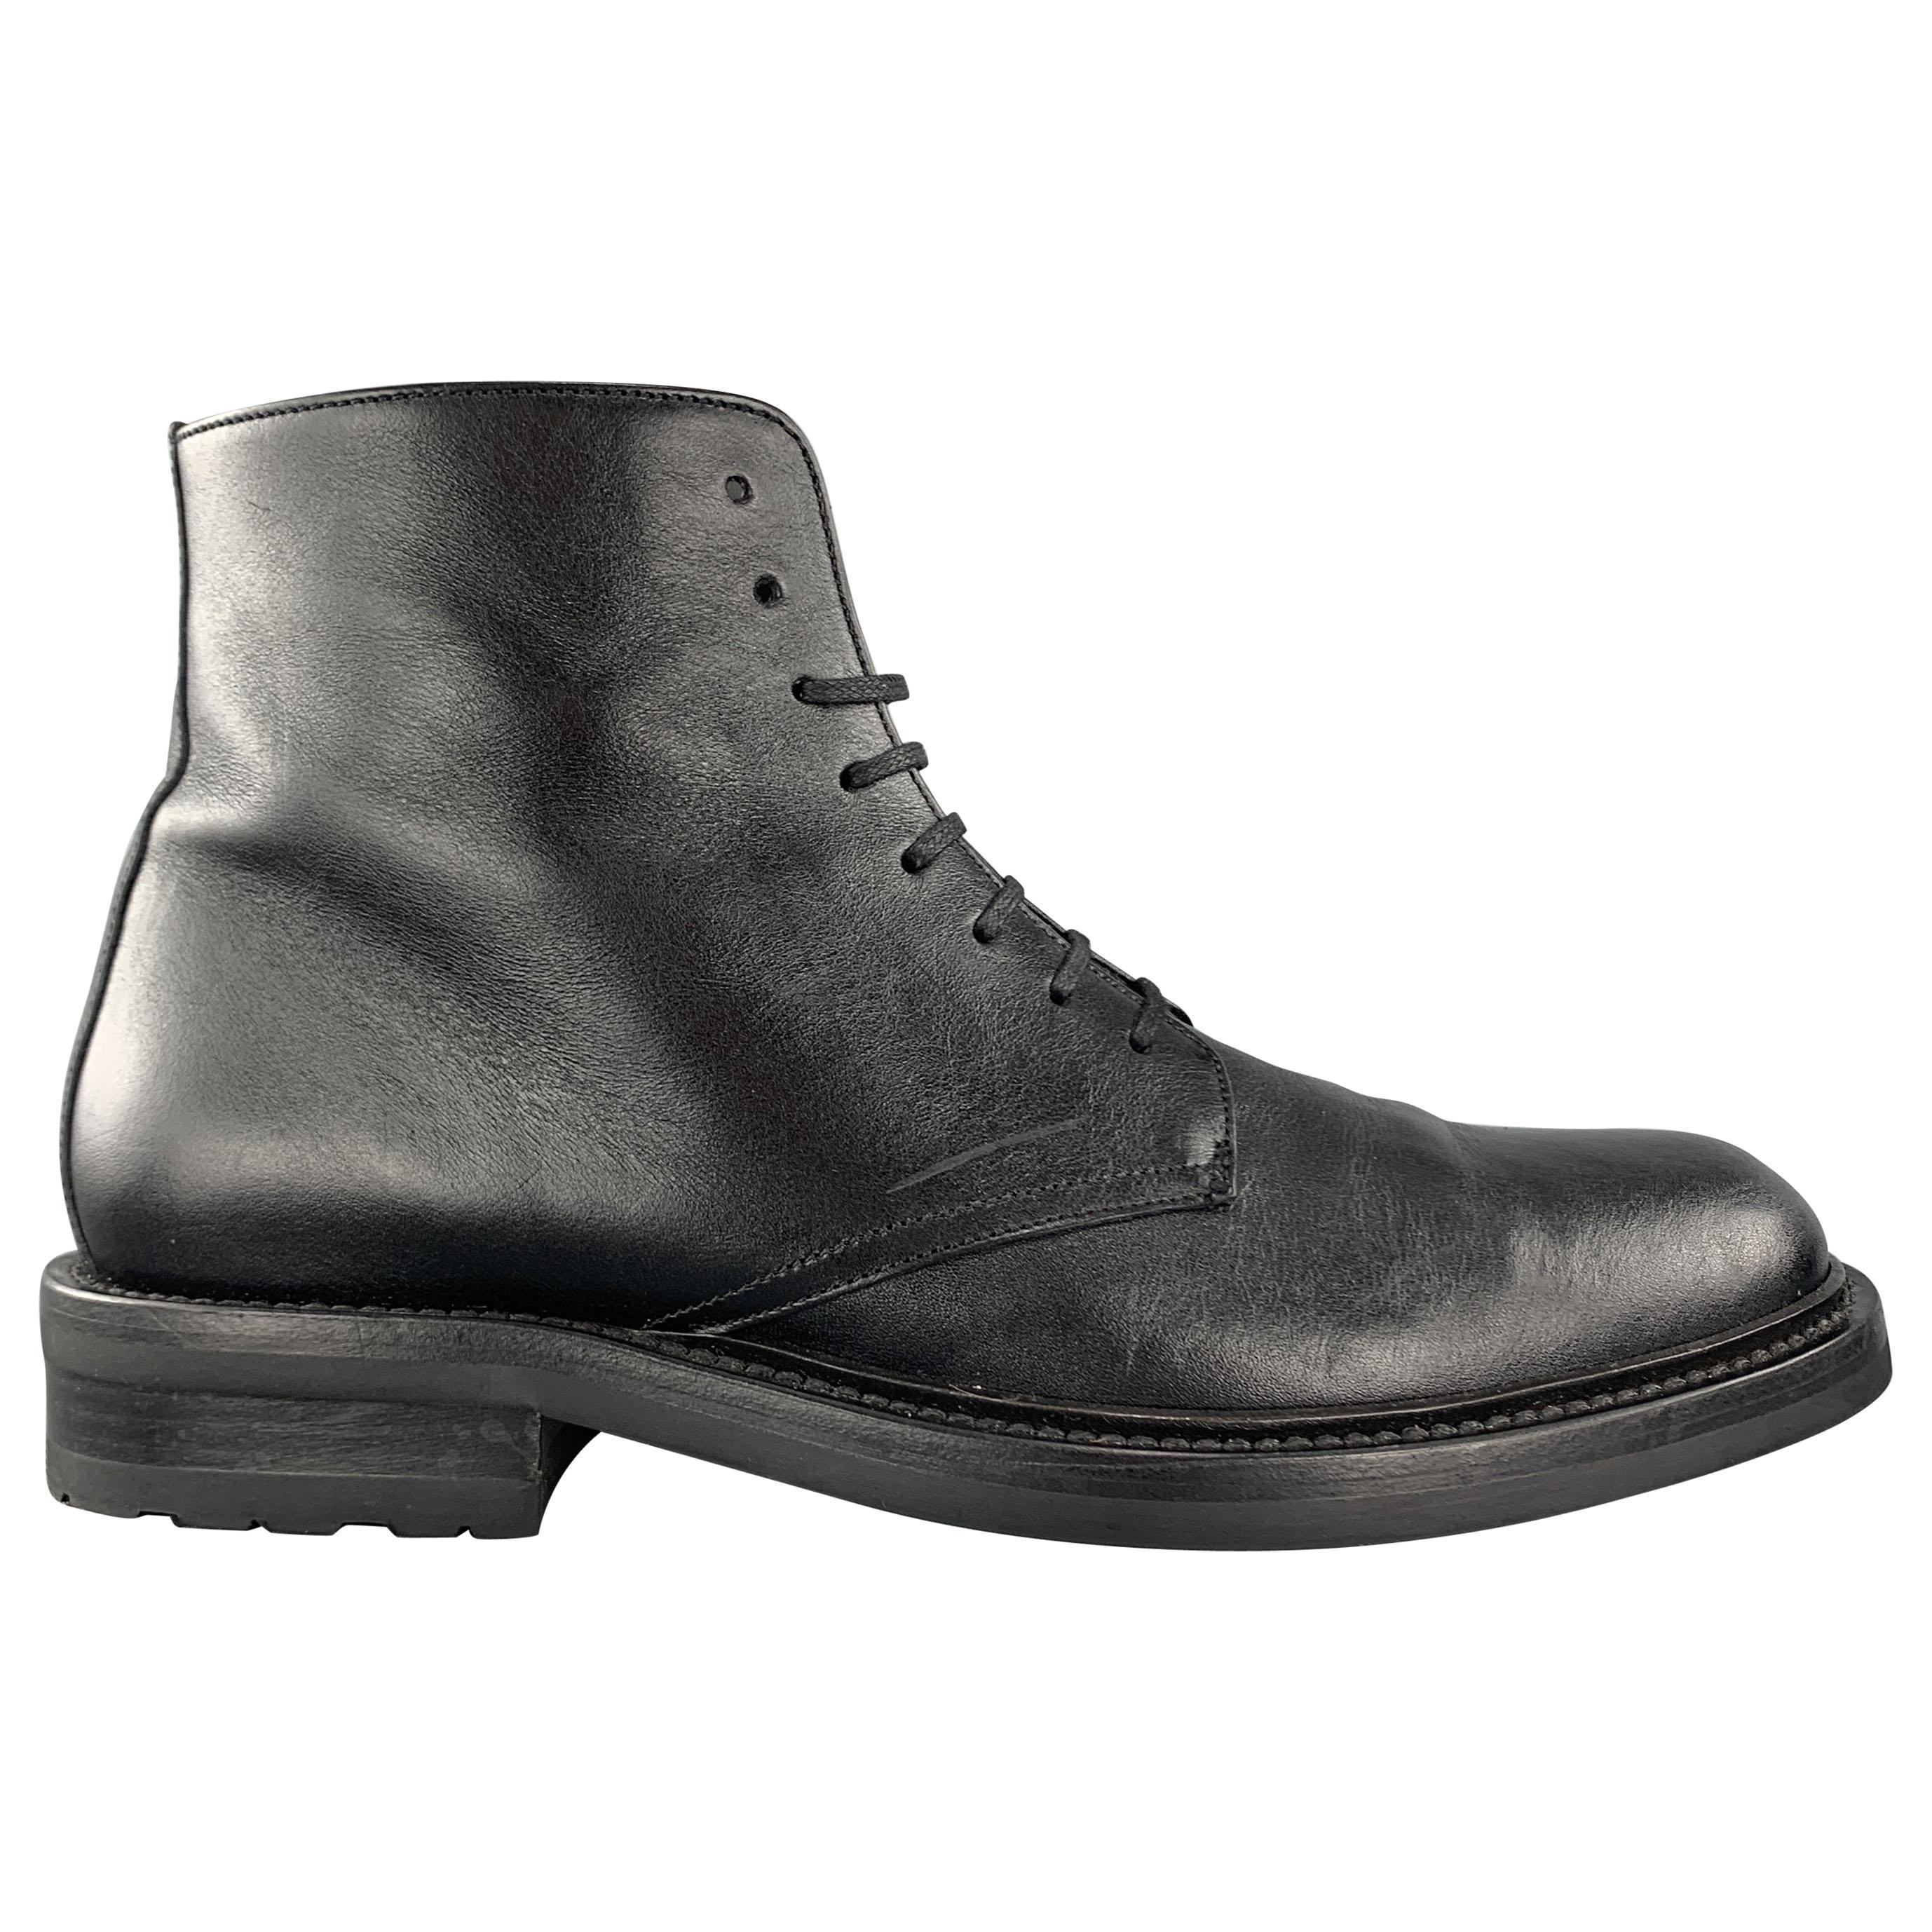 SAINT LAURENT Size 8 Black Leather ARMY 20 Ankle Boots